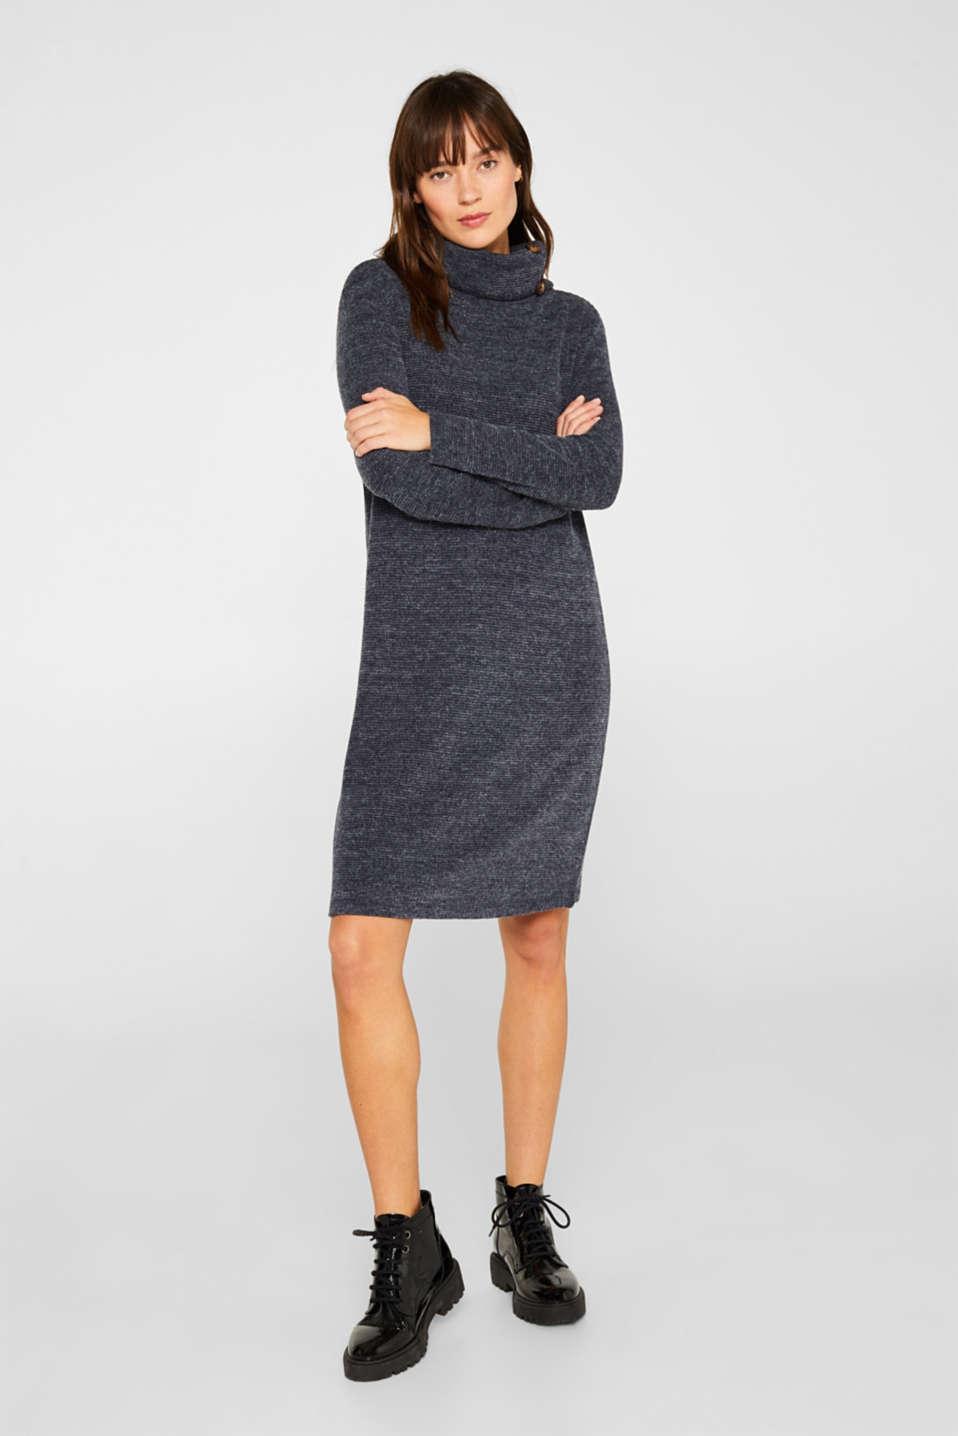 Textured jersey dress, NAVY, detail image number 0